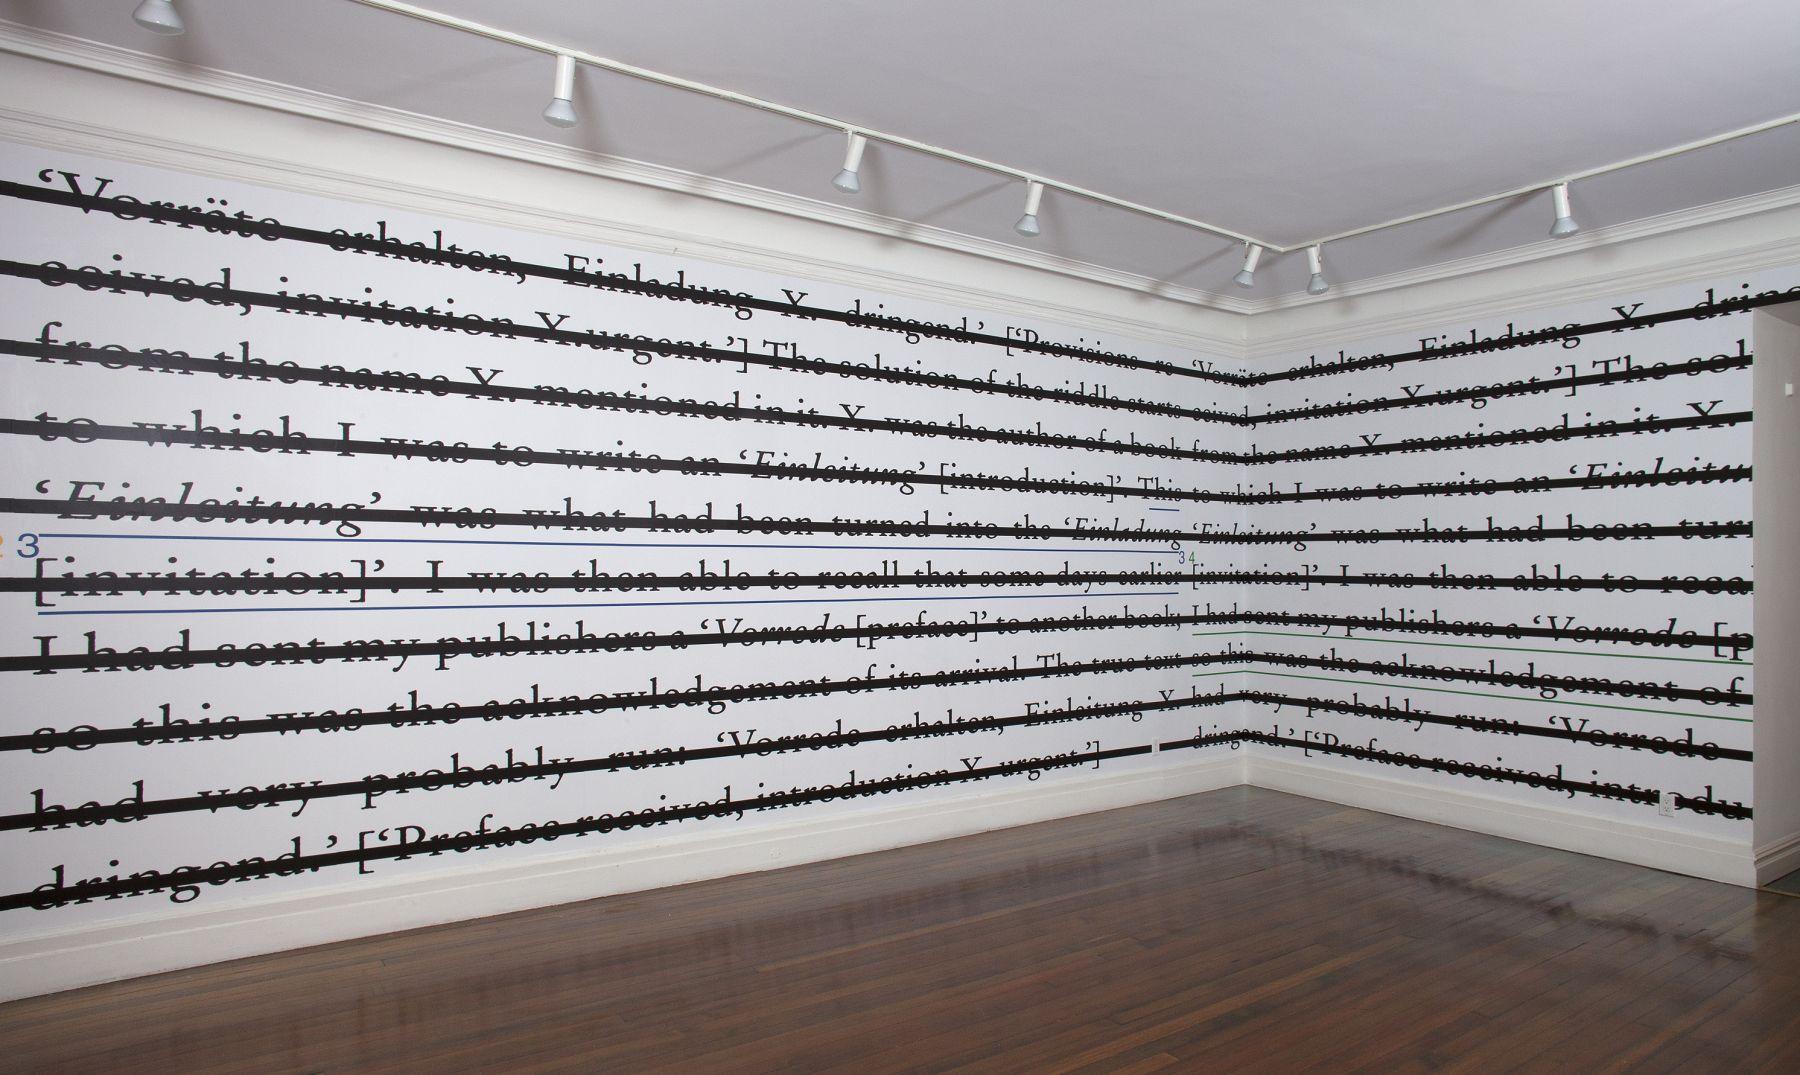 Installation view, Joseph Kosuth: Freud, Wittgenstein and Musil, 18 EAST 77.